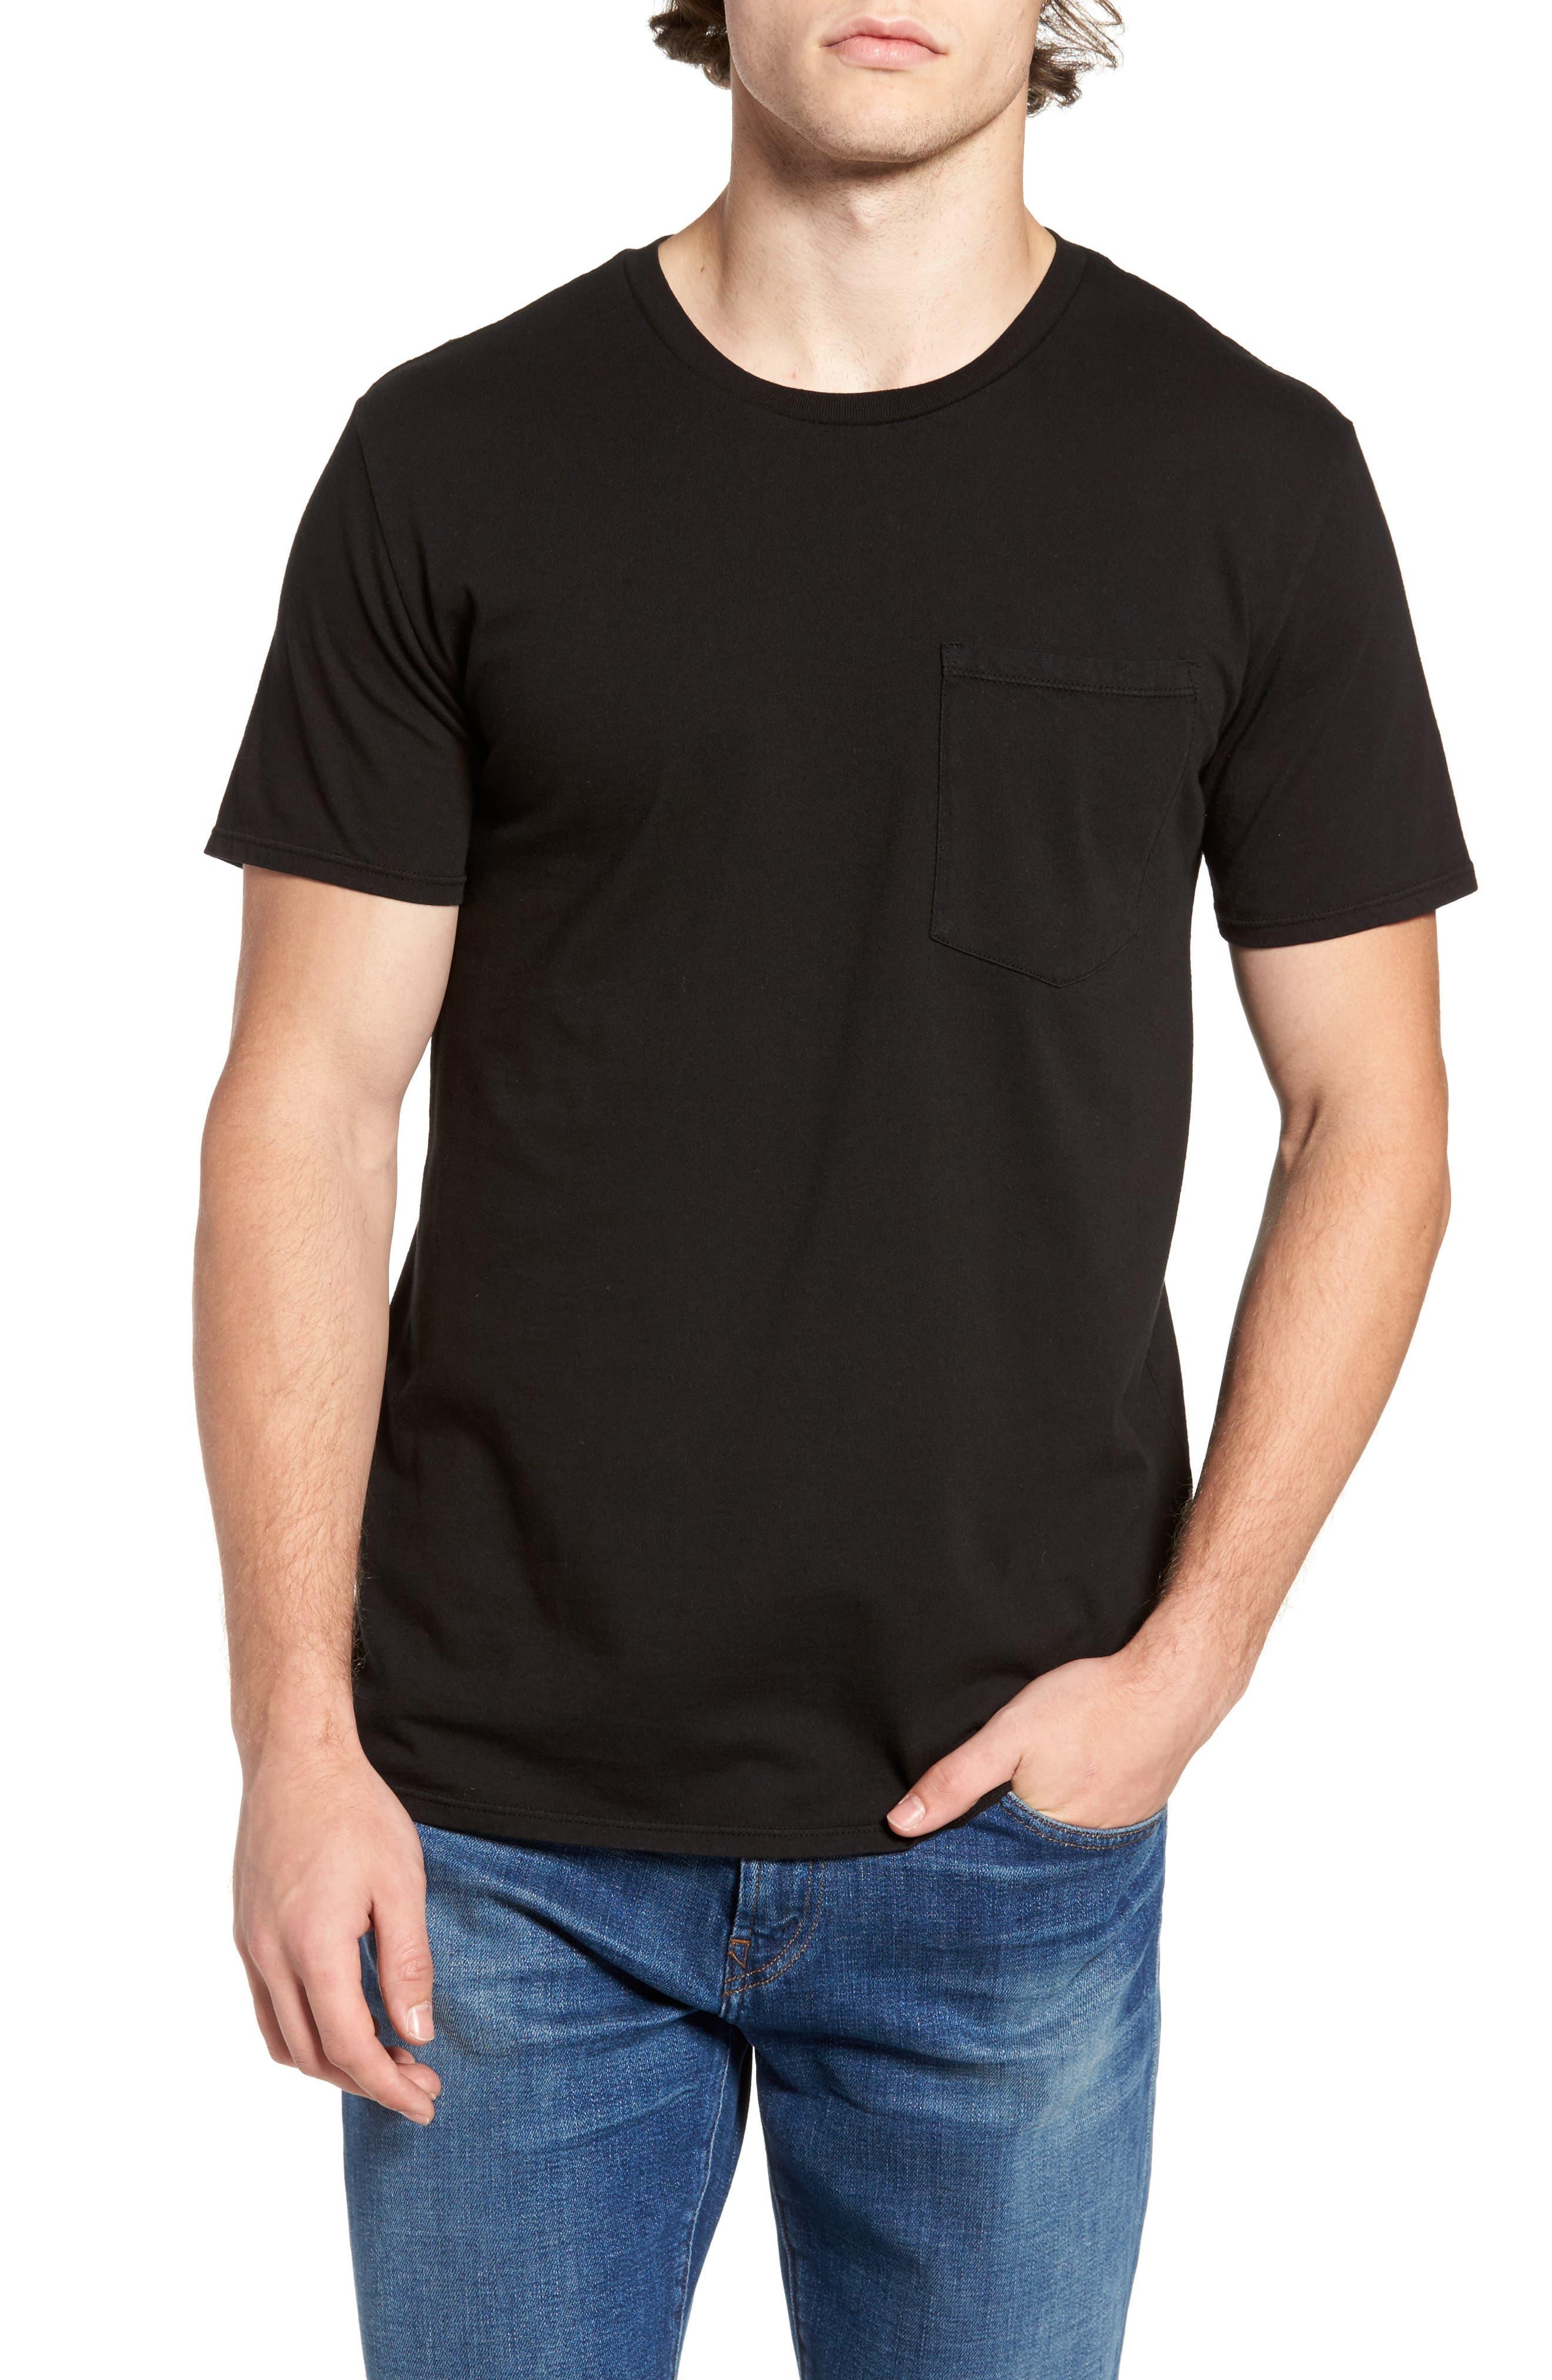 Alternate Image 1 Selected - Original Paperbacks Pocket T-Shirt